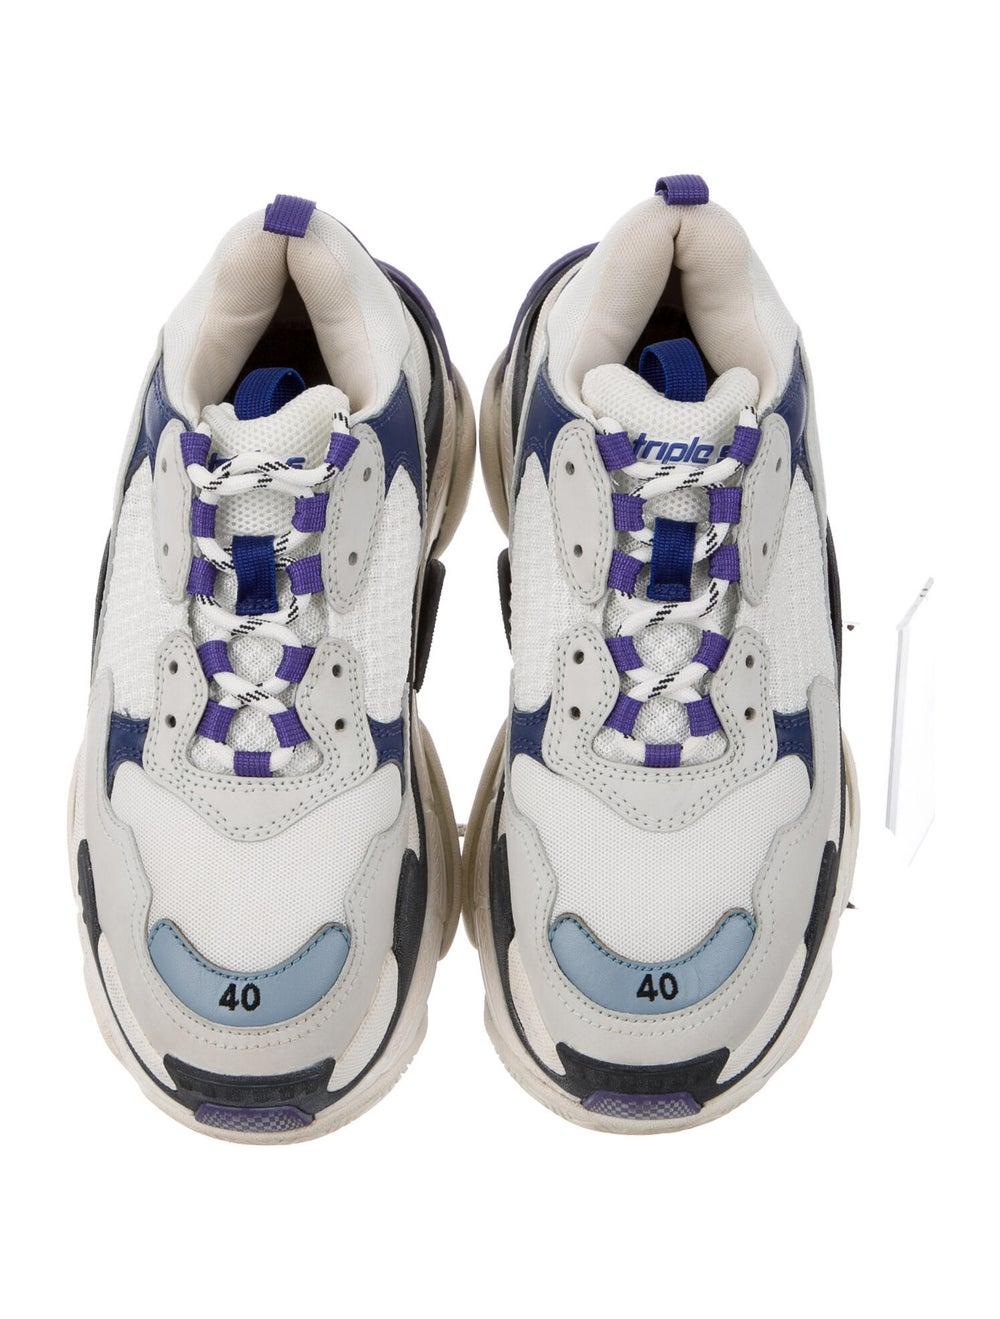 Balenciaga Triple S Chunky Sneakers Blue - image 3